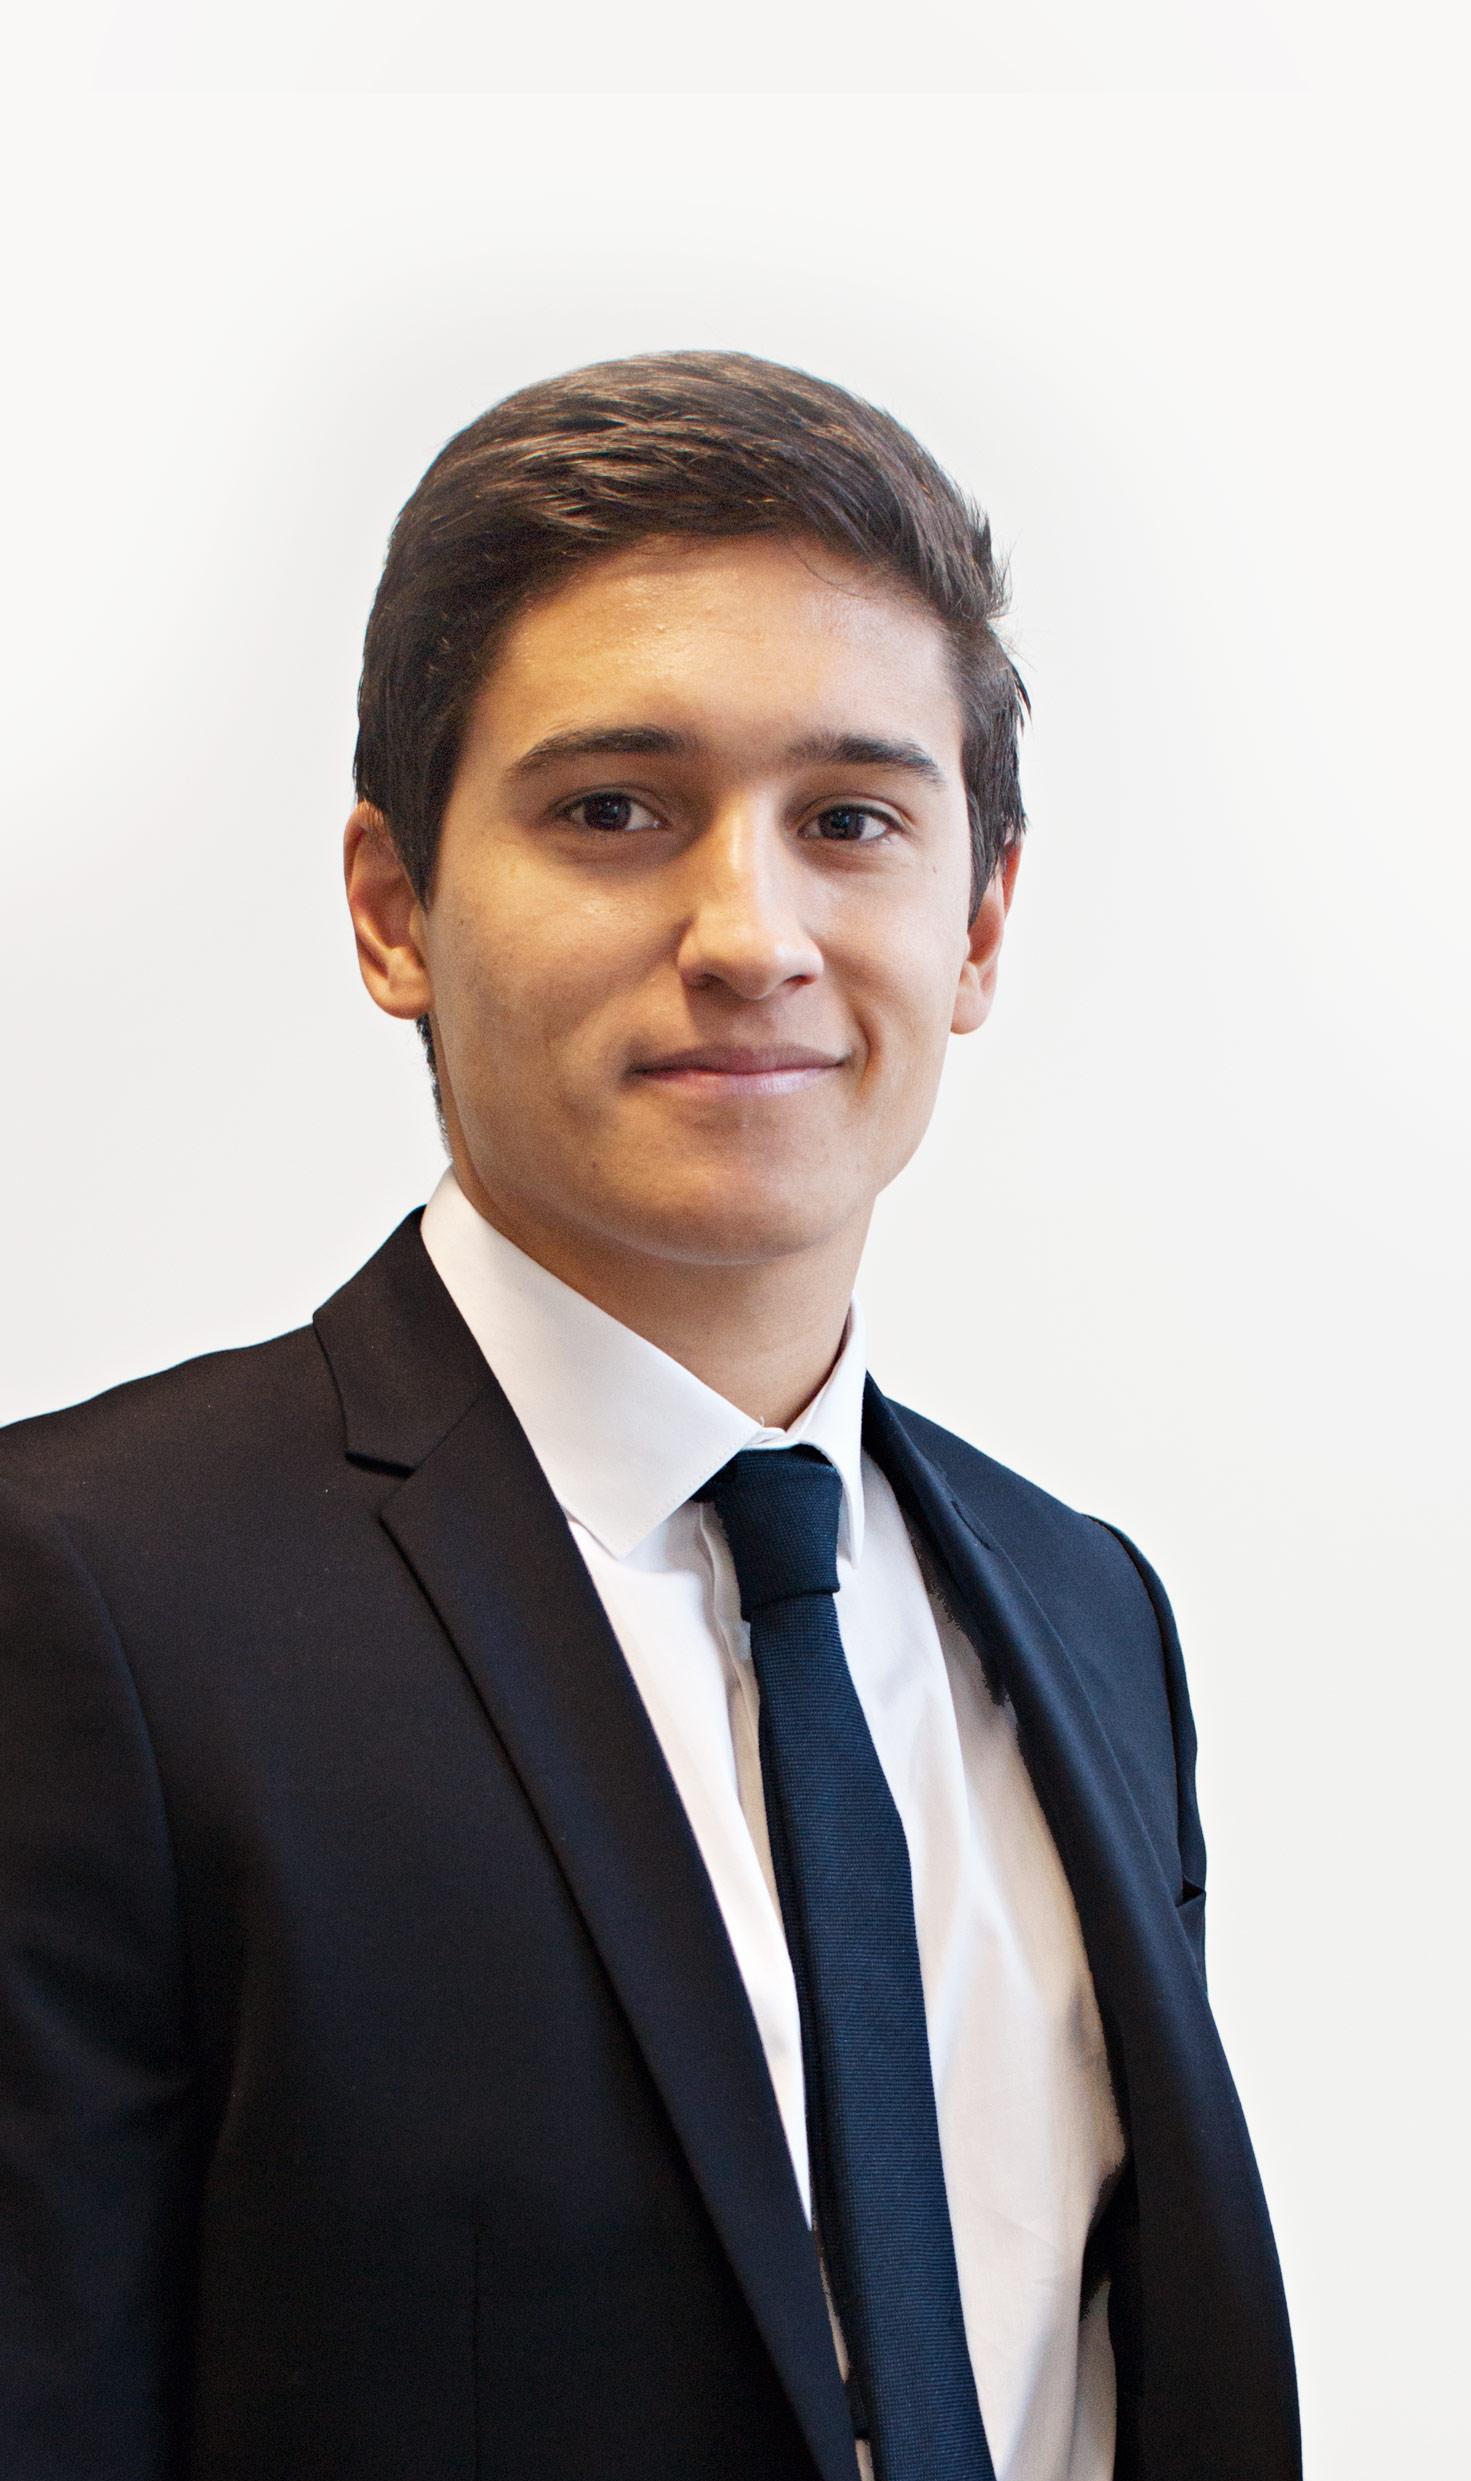 Yassine Amanallah